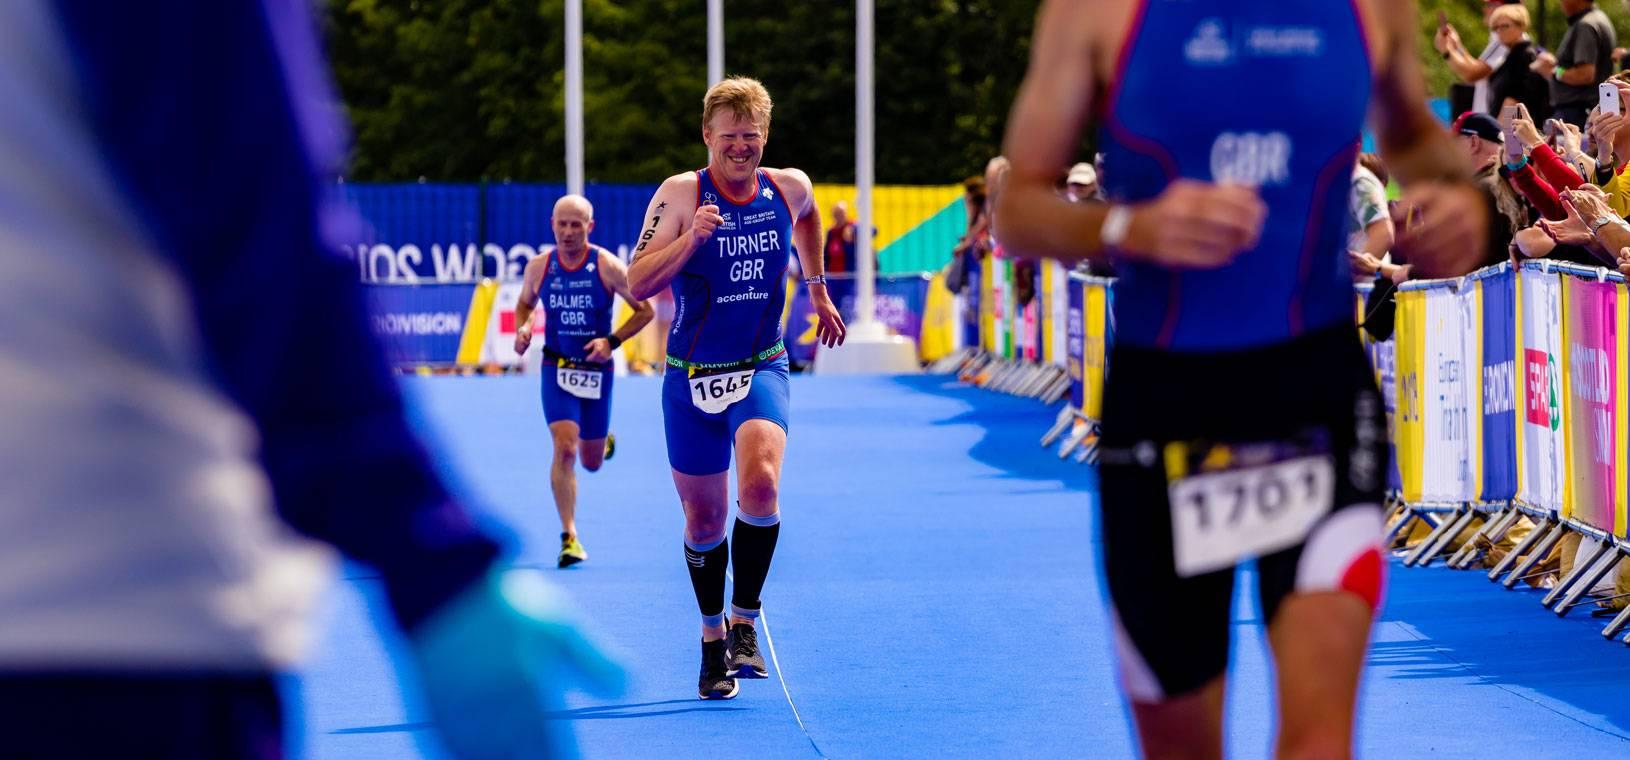 b5777215a4a British Triathlon and Home Nation Major Events Calendar announced for 2019  – British Triathlon